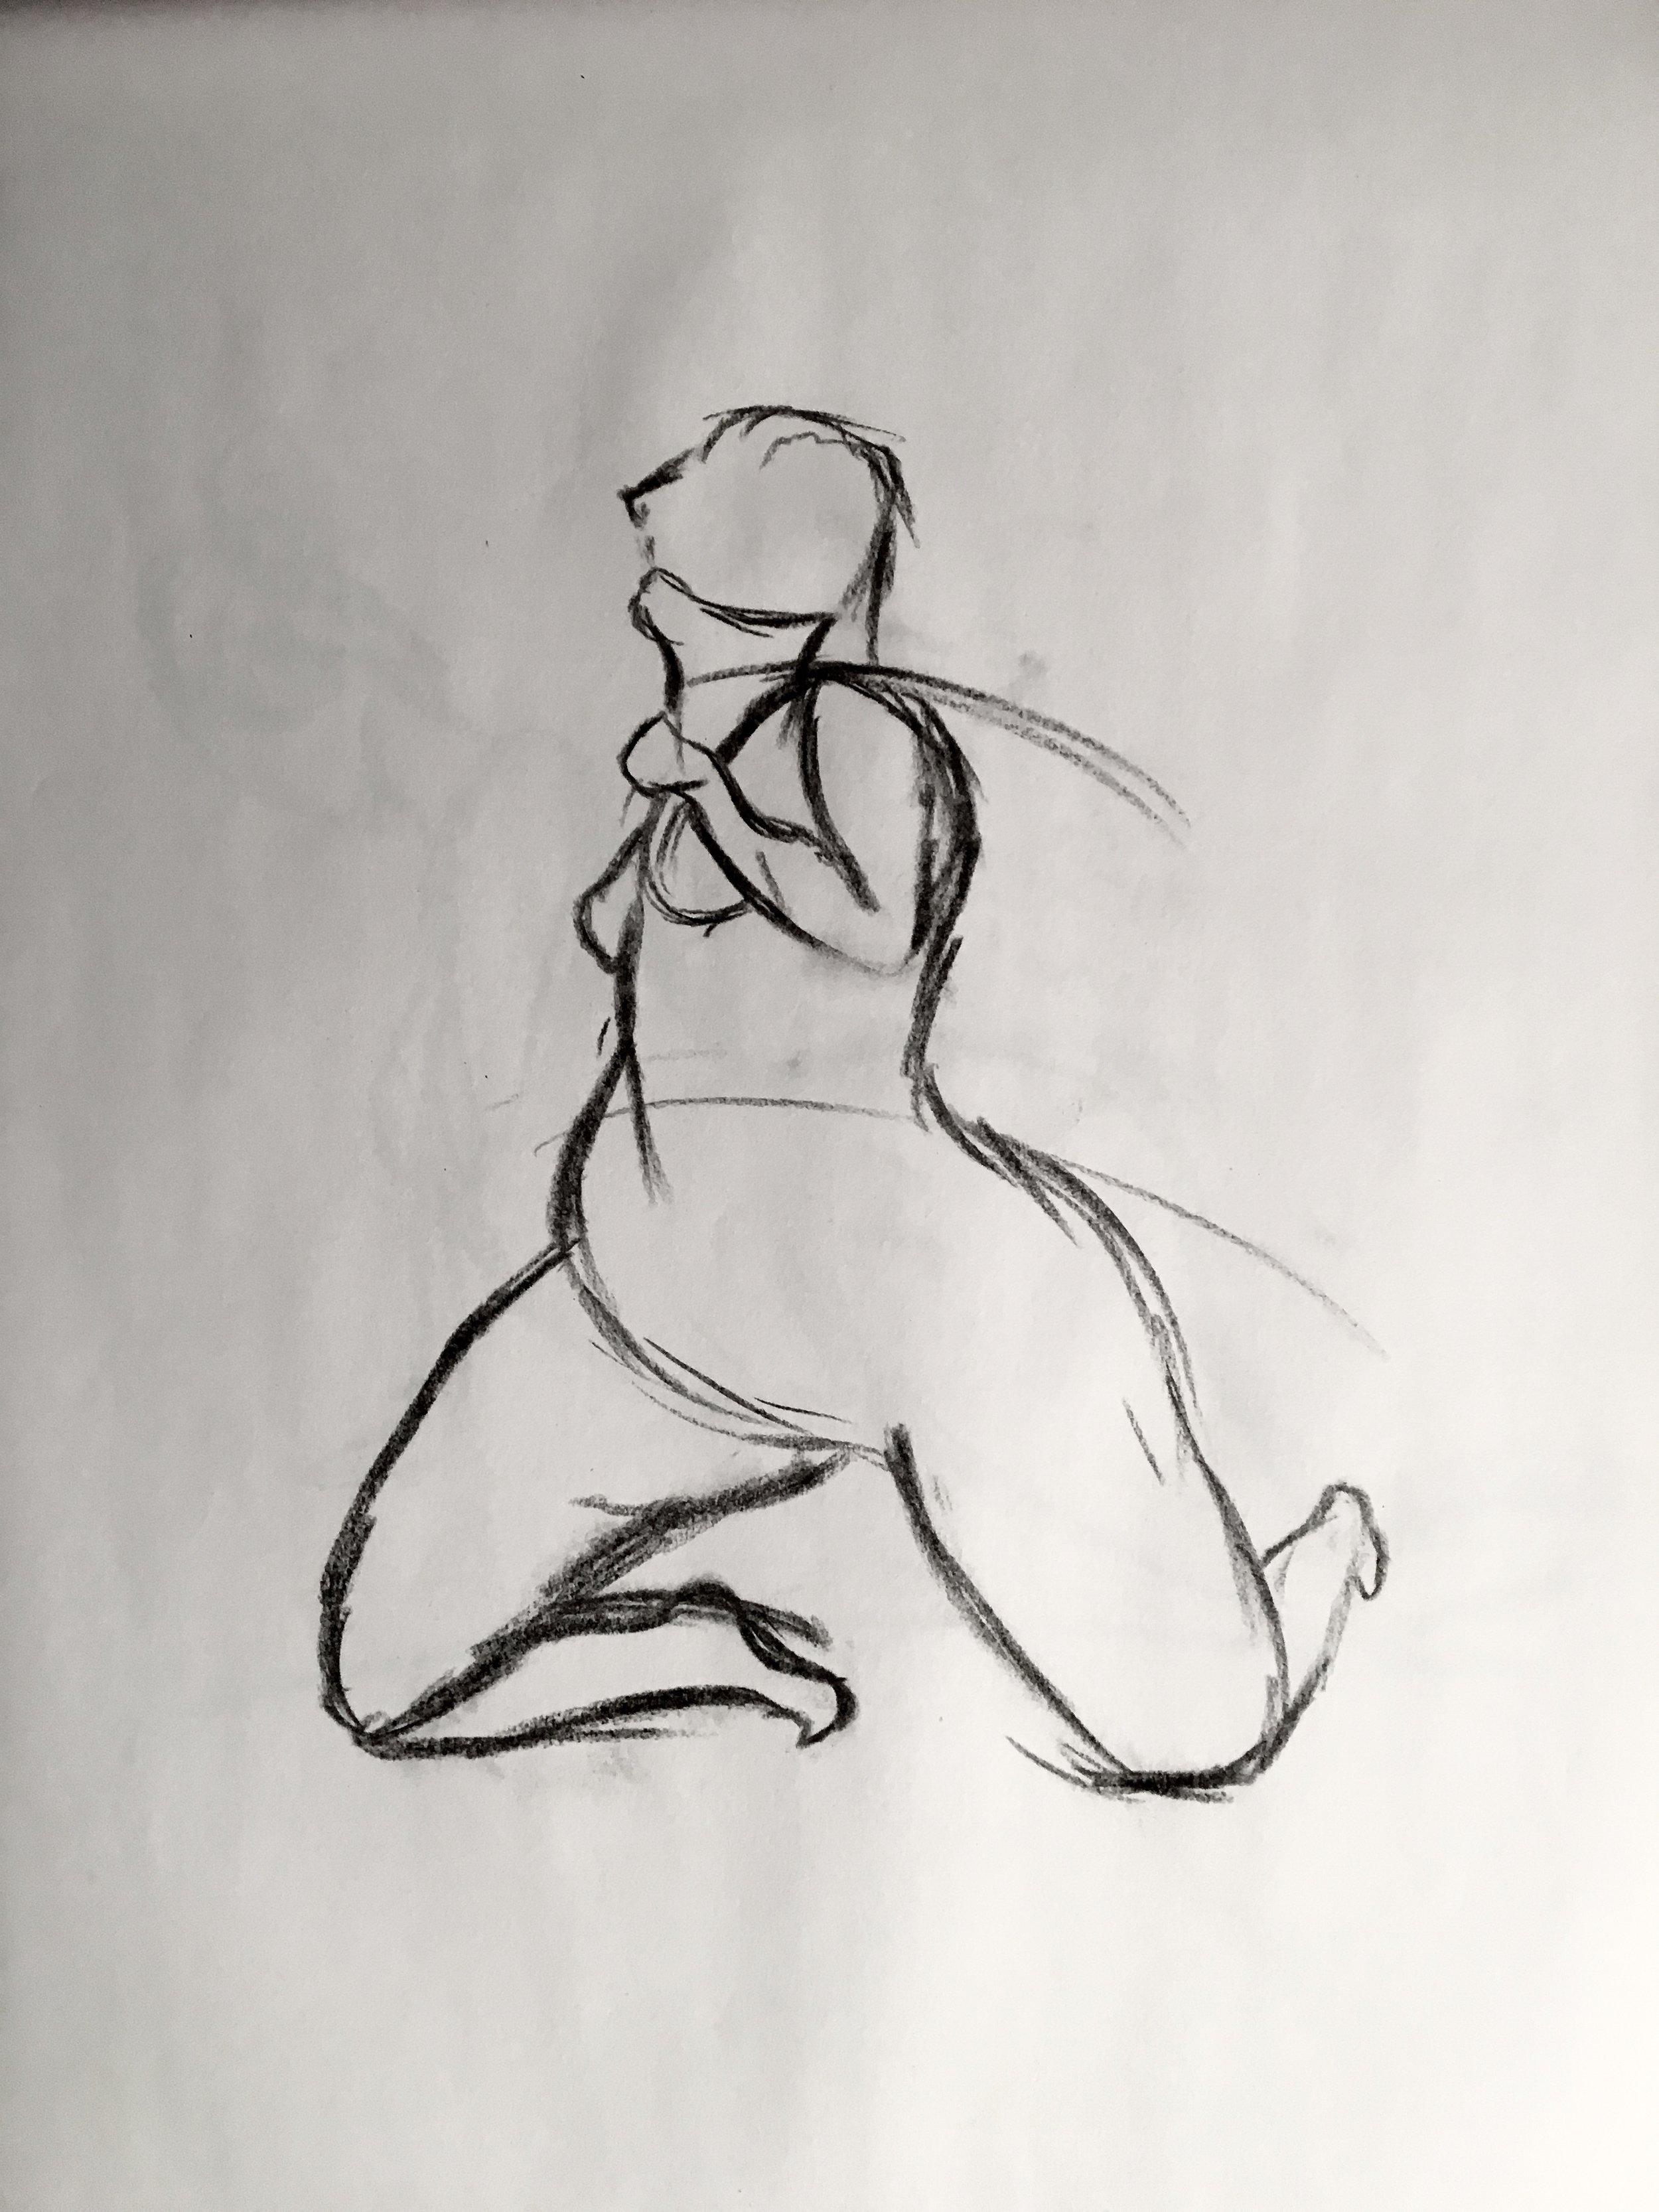 Woman    -     Charcoal - 18x24 - 2017